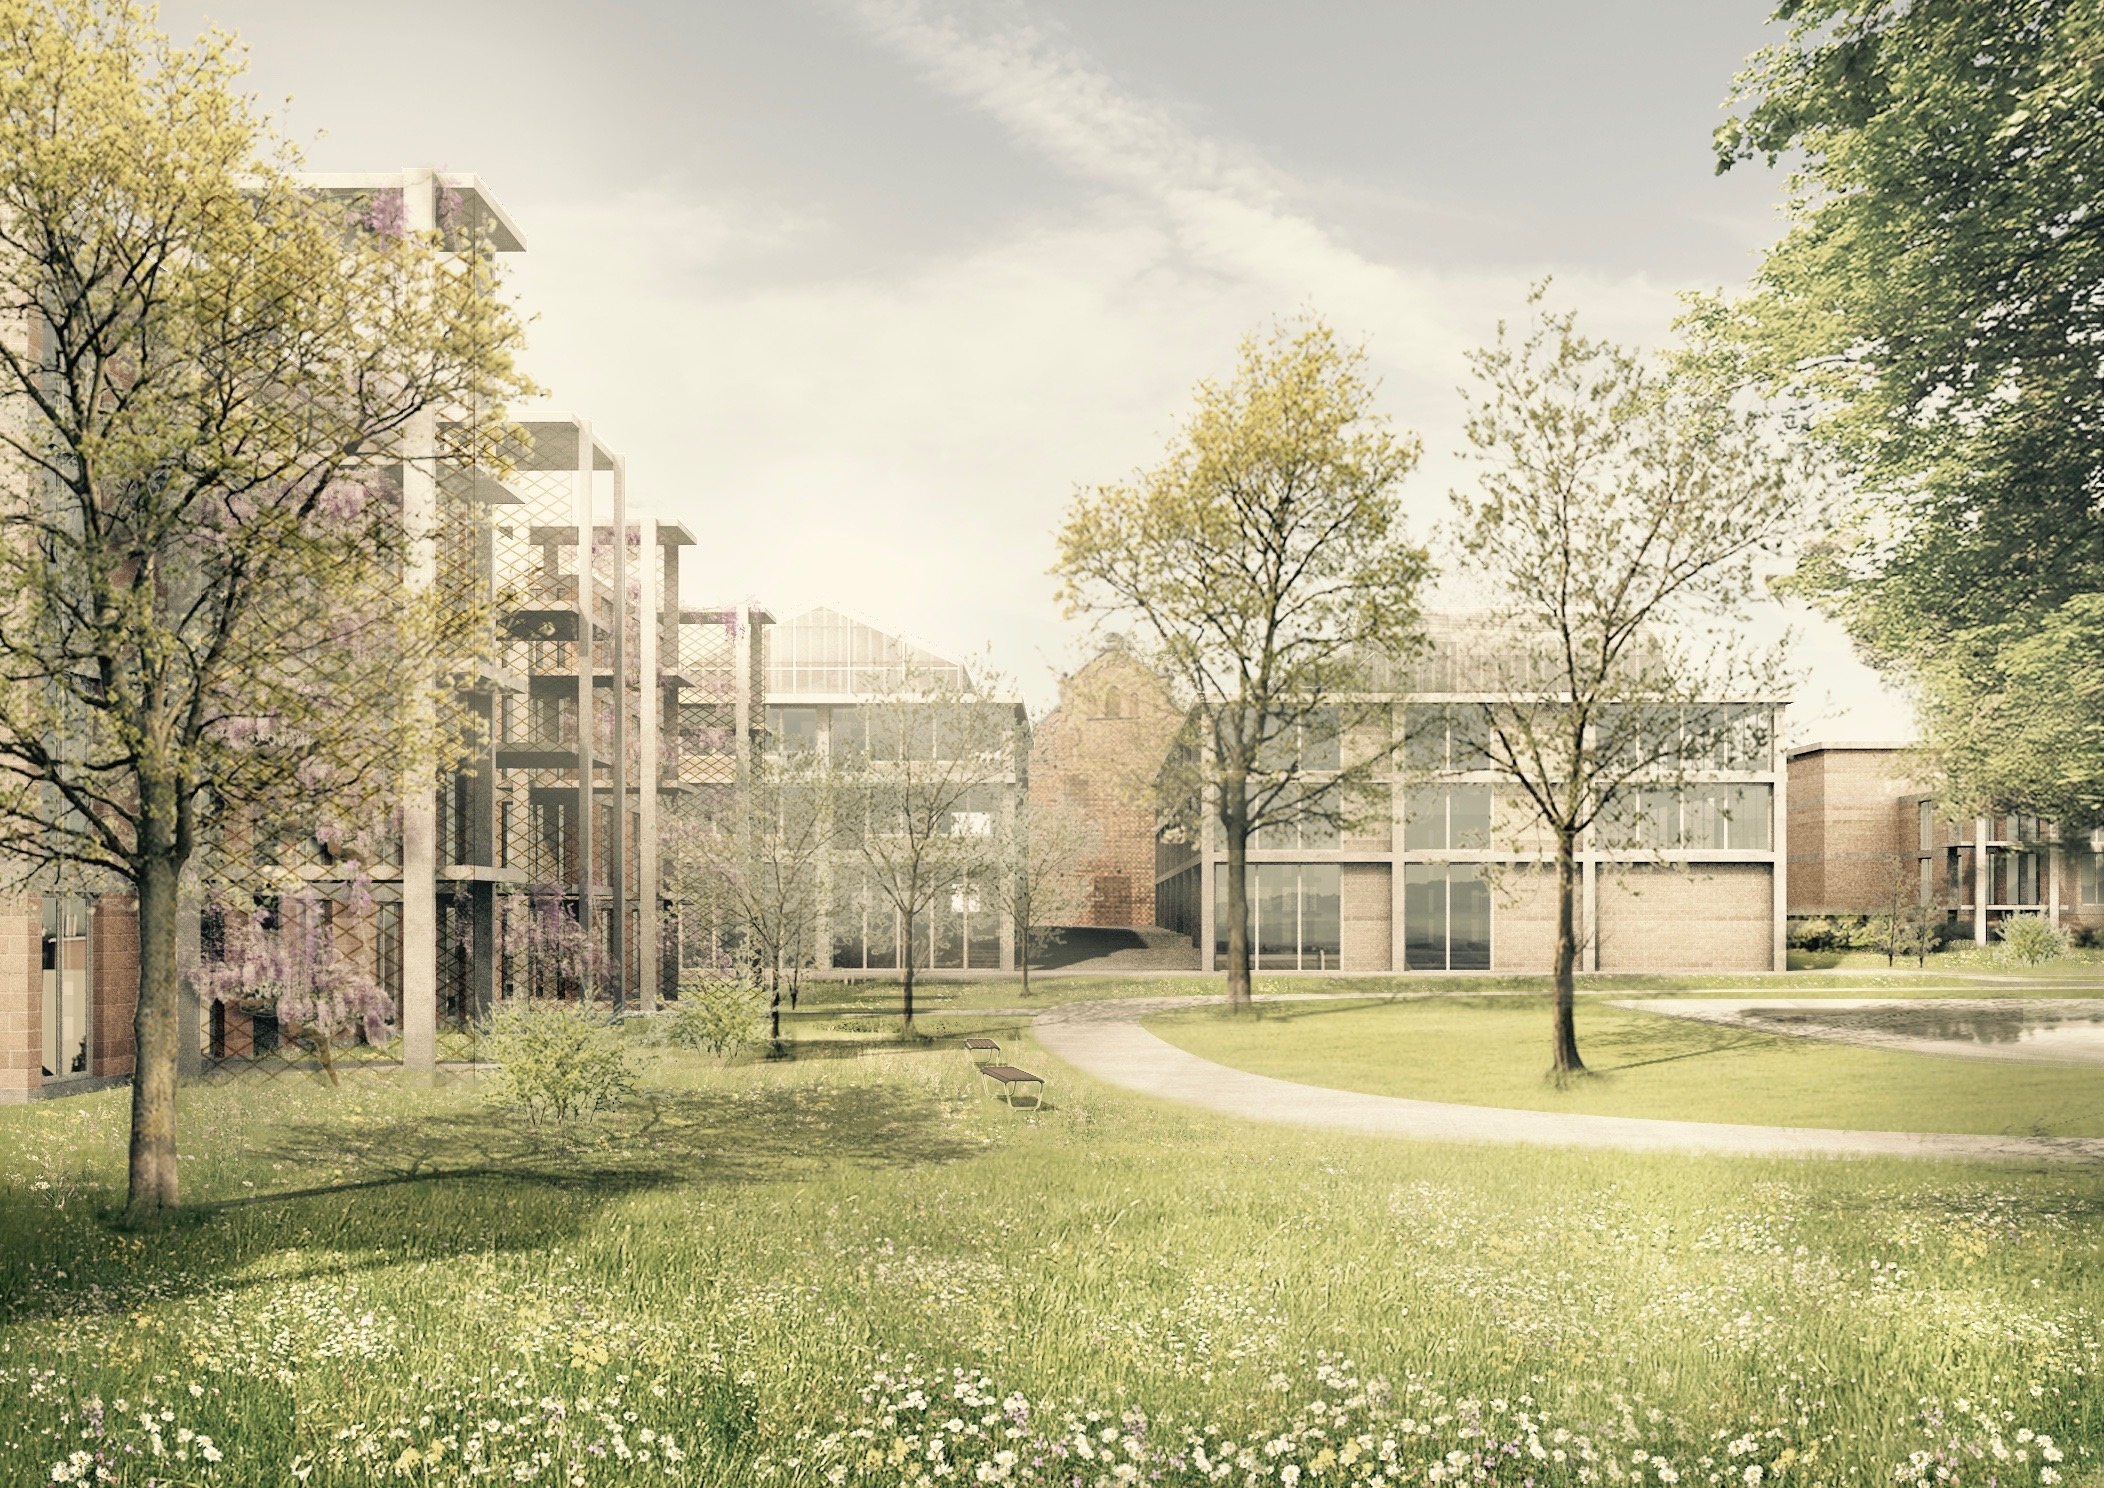 Richtprojekt Ziegelei Berg: Blick Richtung alte Ziegelei